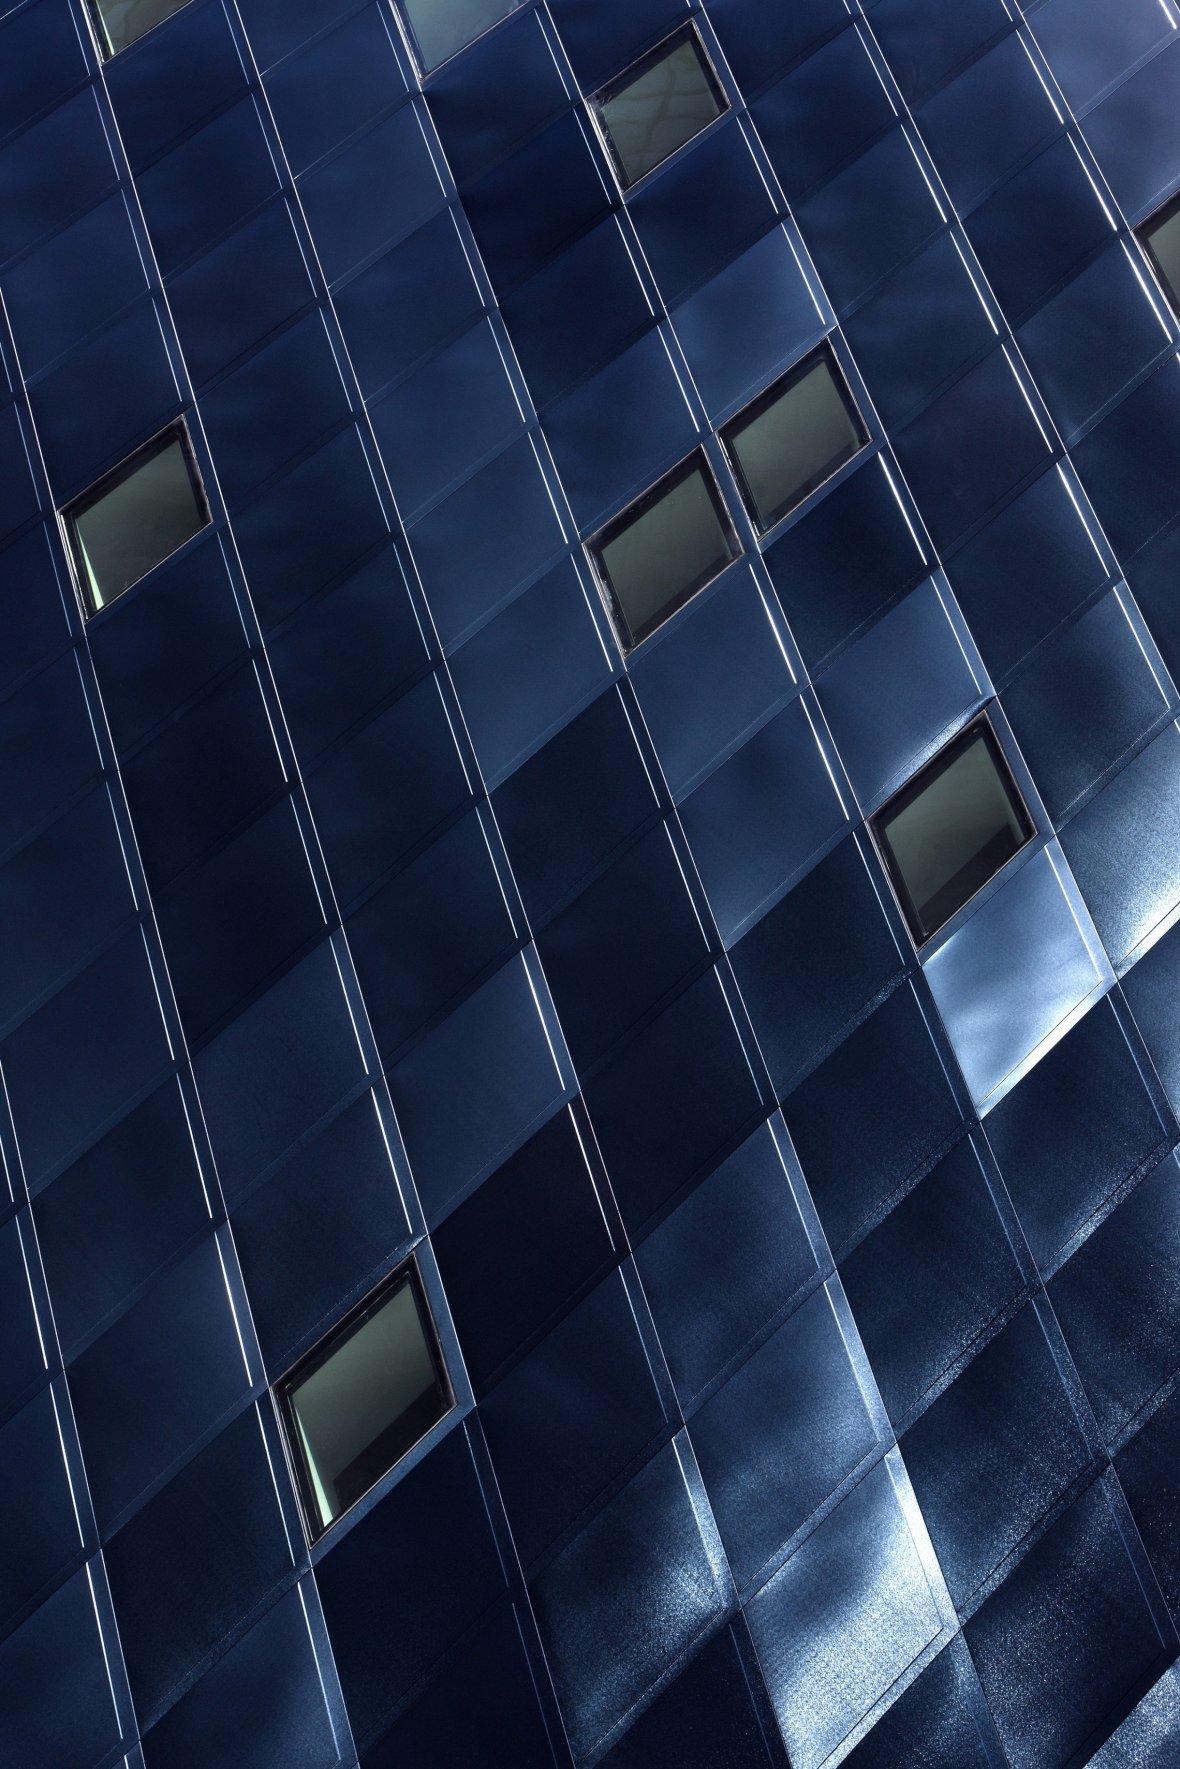 detail-of-blue-steel-cladding-c-bitterbredt-2280x3419